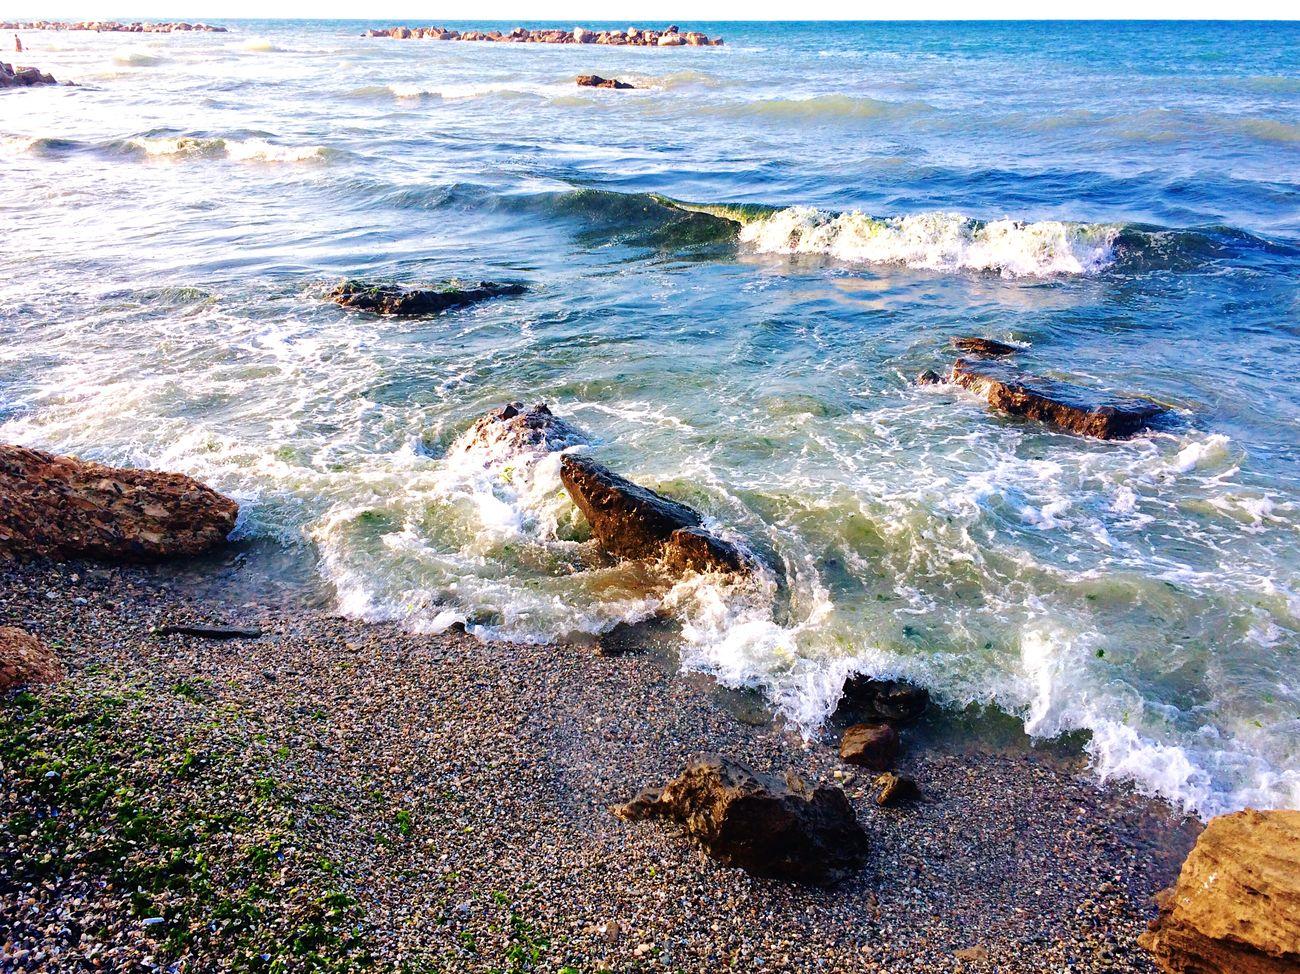 Sea Summer Italy Beach Freedom Spetacular Enjoying Life Coast Nature Waves